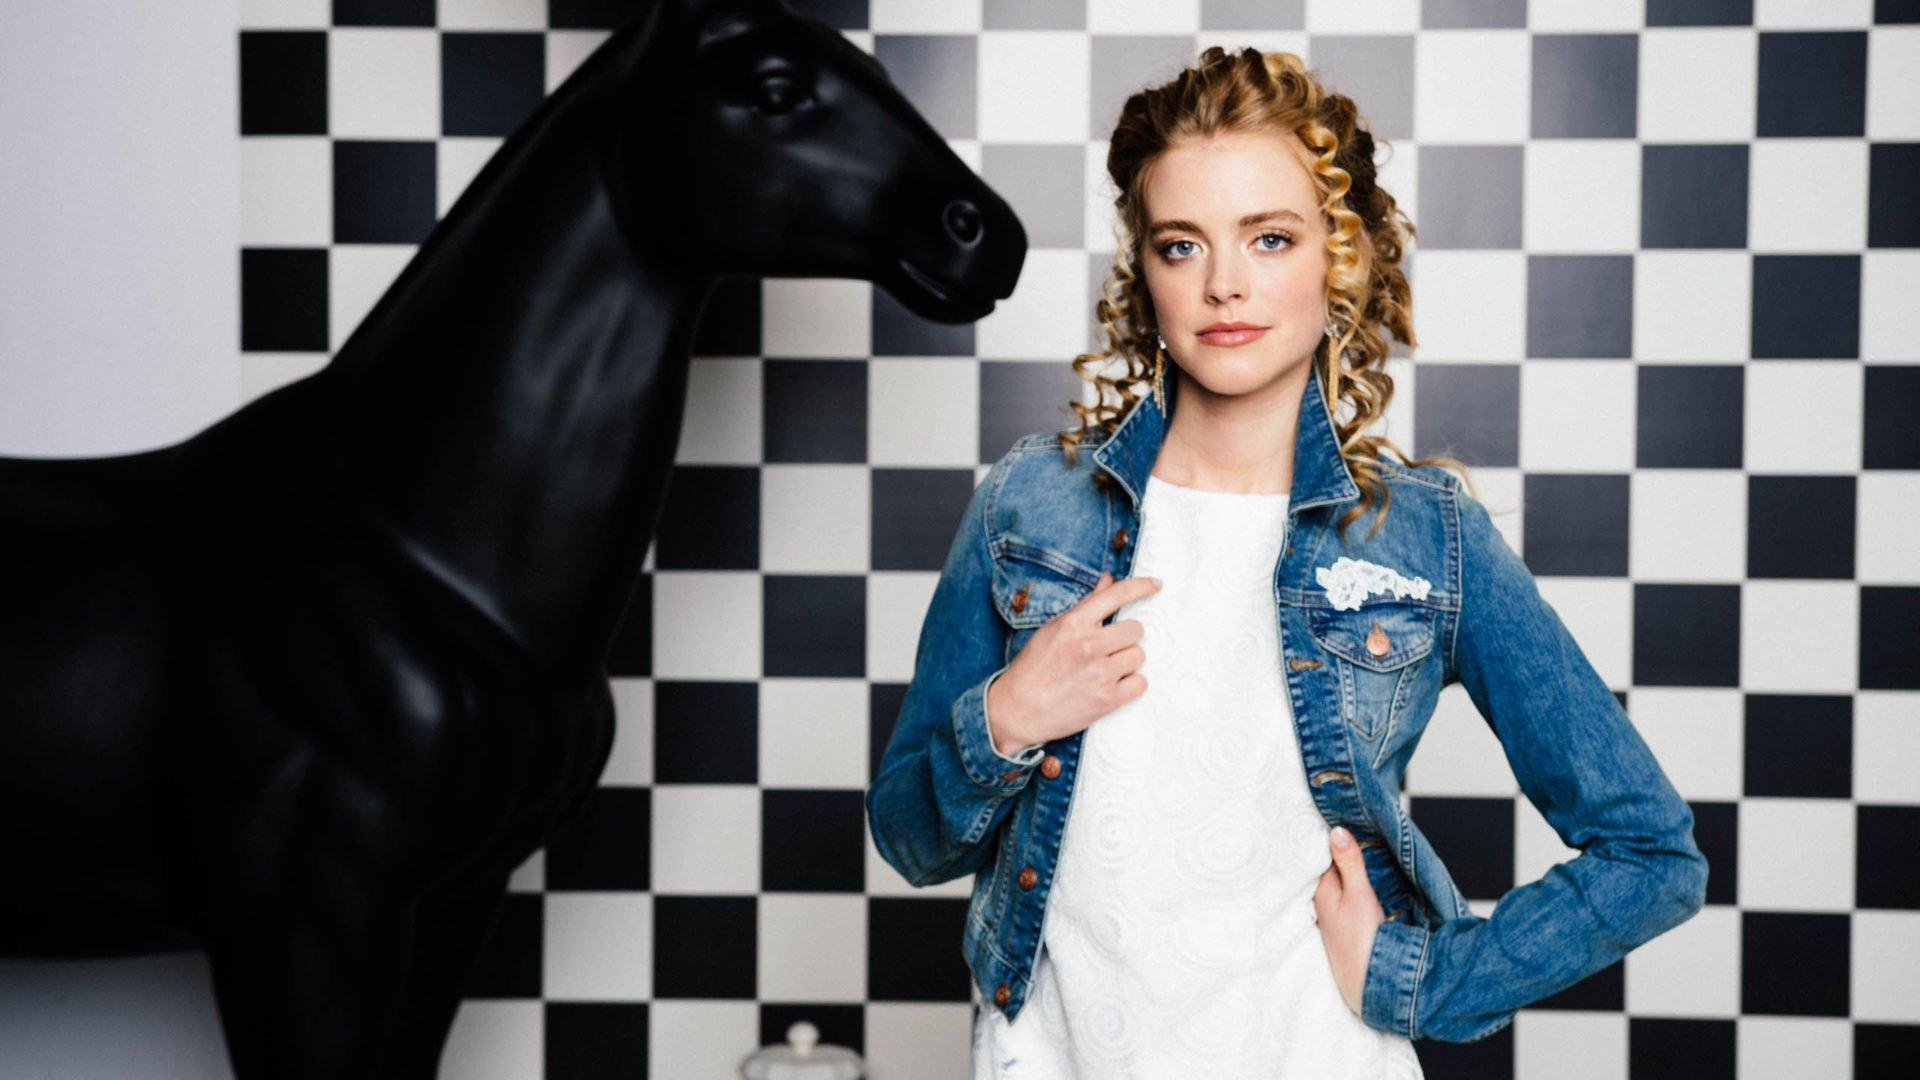 Brautkleider 2020 – coole Jeansjacke & große Accessoiresauswahl